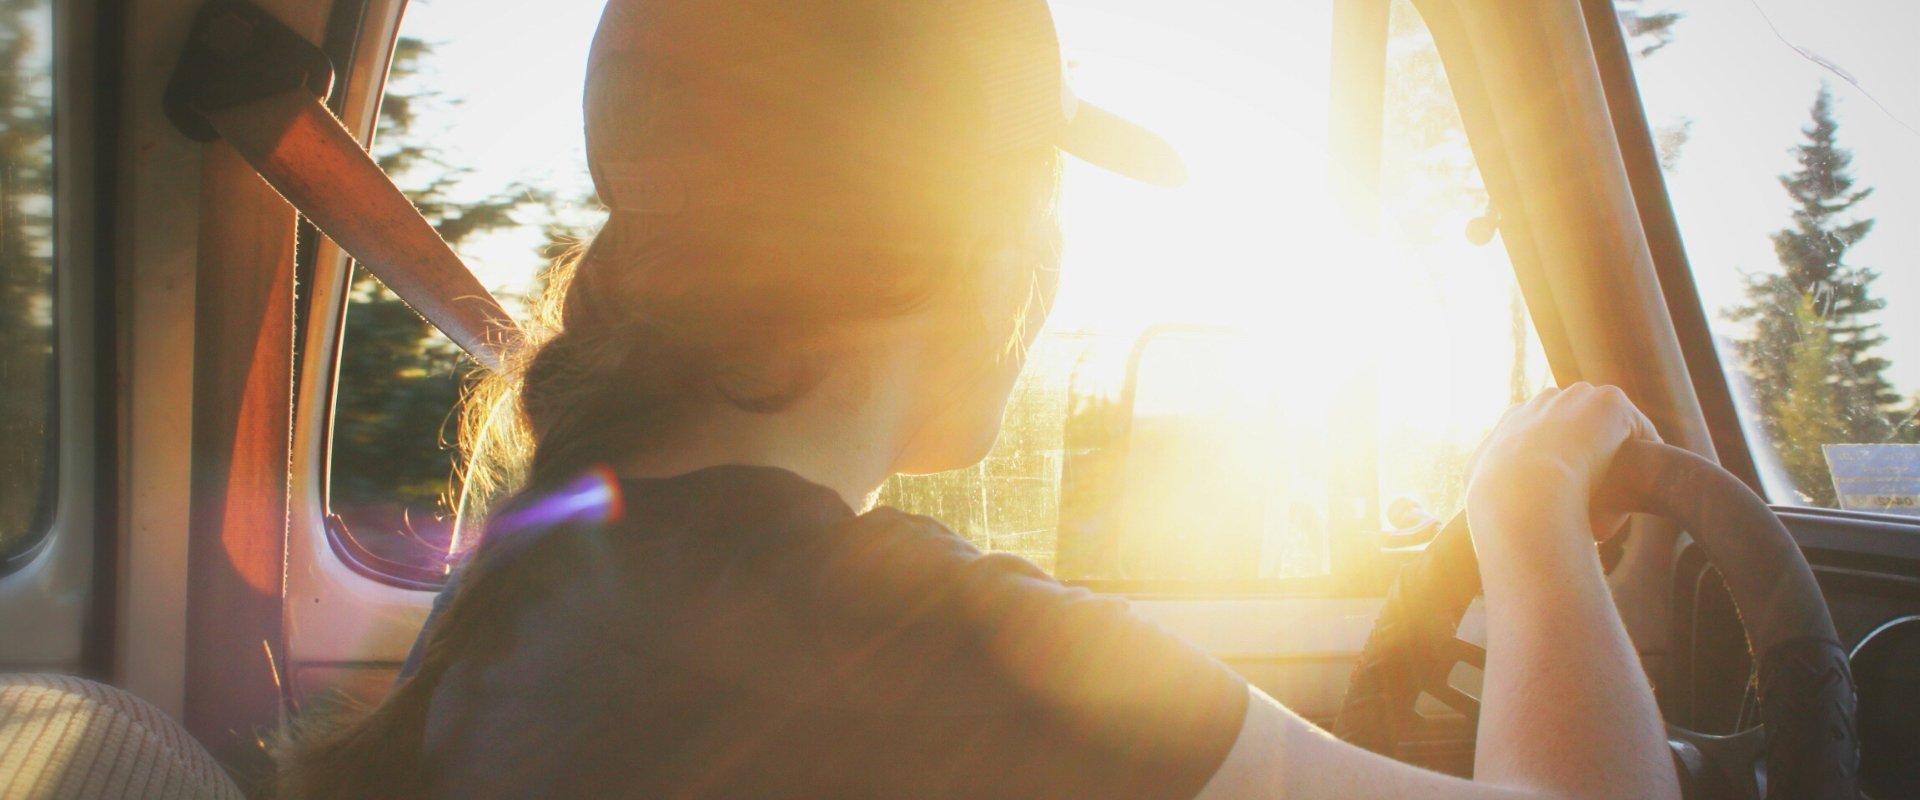 Sunny road trip